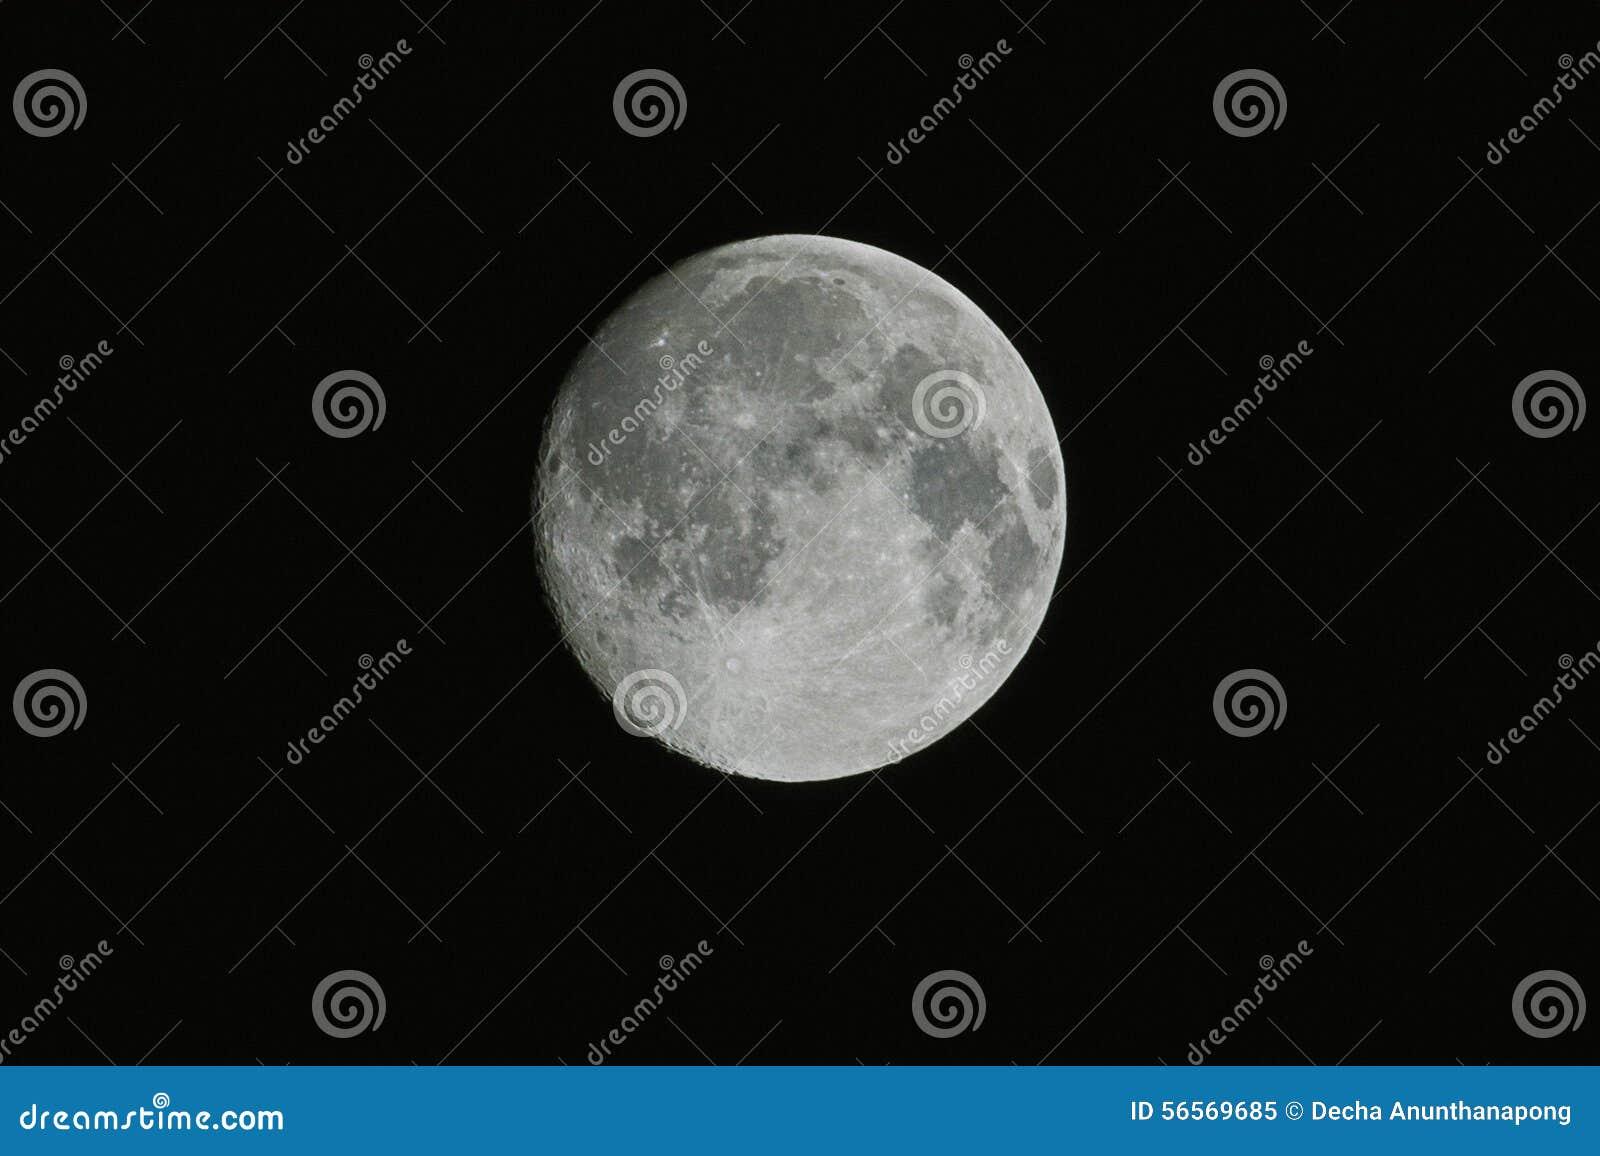 Download Το φεγγάρι που θέτει στον ουρανό Στοκ Εικόνα - εικόνα από φεγγάρι, μαύρα: 56569685